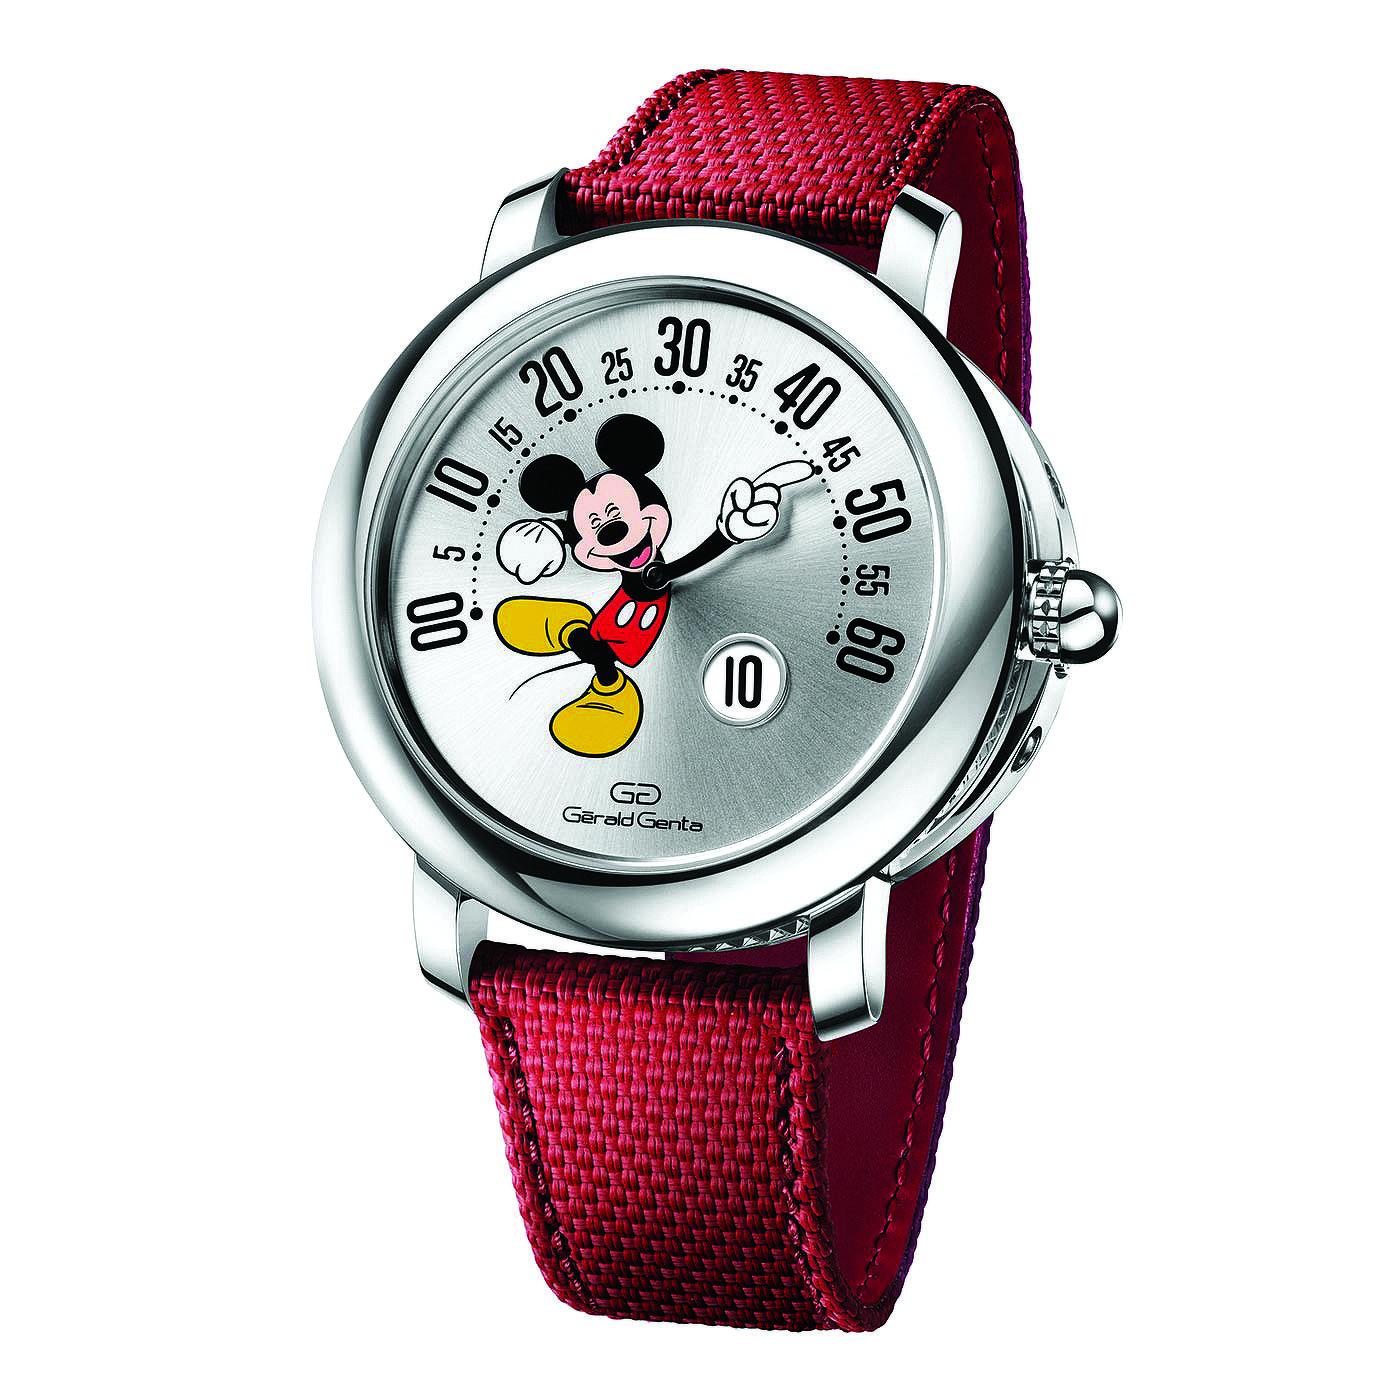 Mickey Mouse Bulgari - THE EDGE SINGAPORE